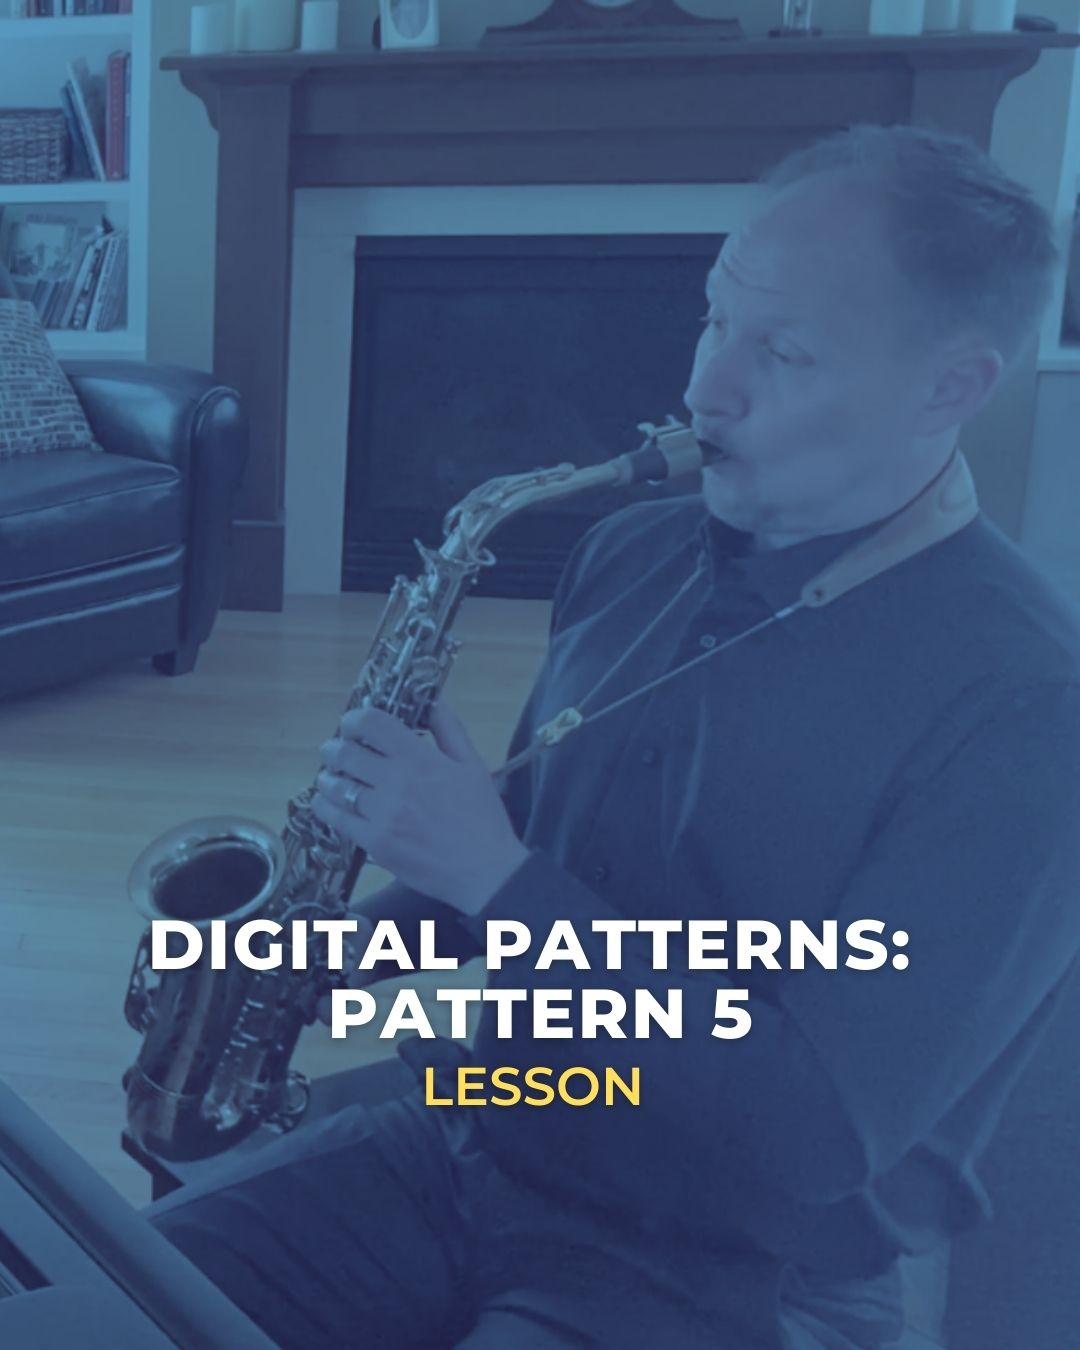 Digital Pattern 5